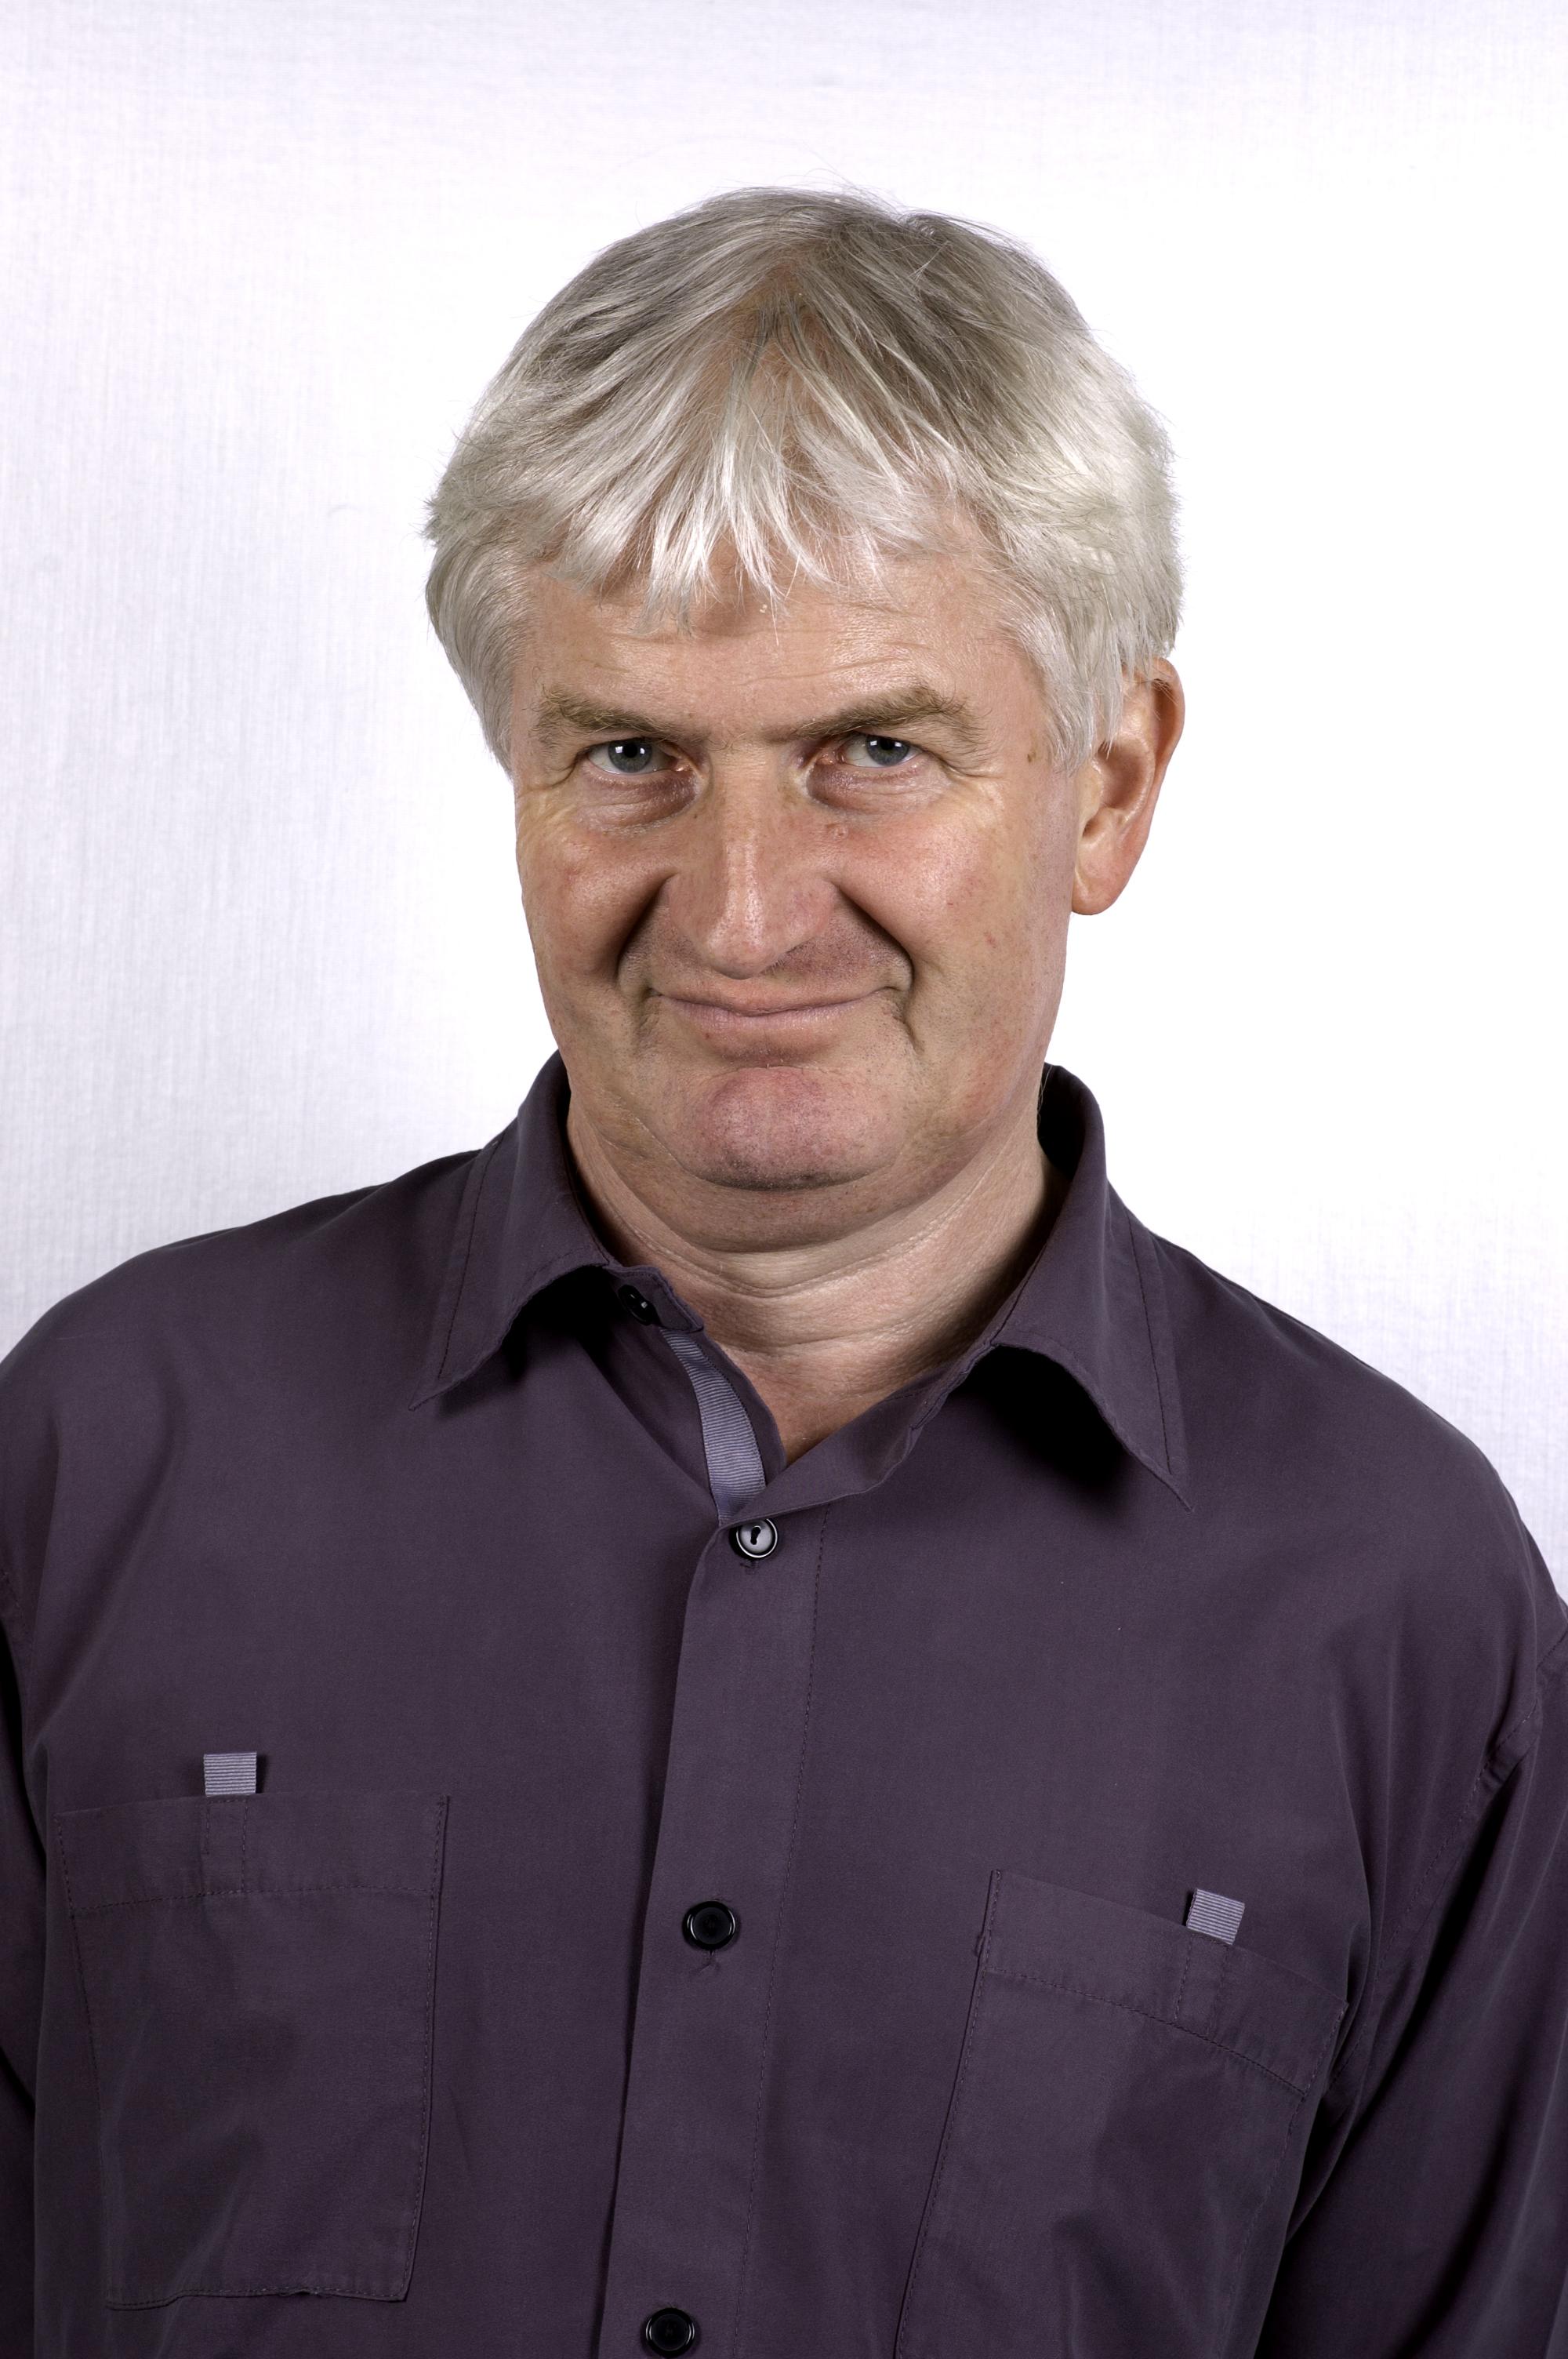 Patrick Rombauts